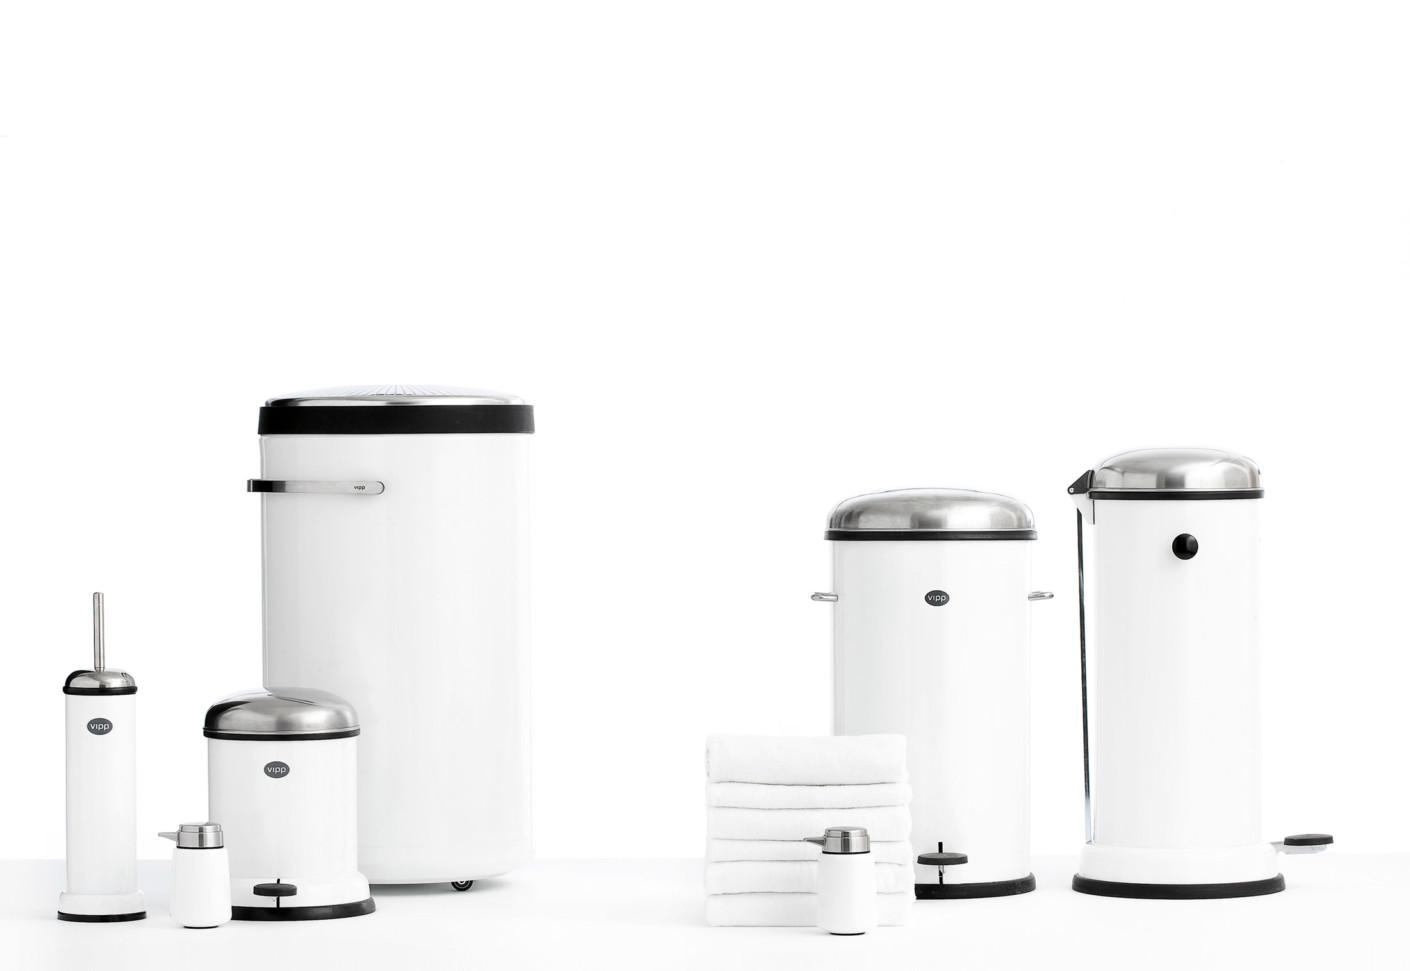 Laundry Basket by Vipp | STYLEPARK